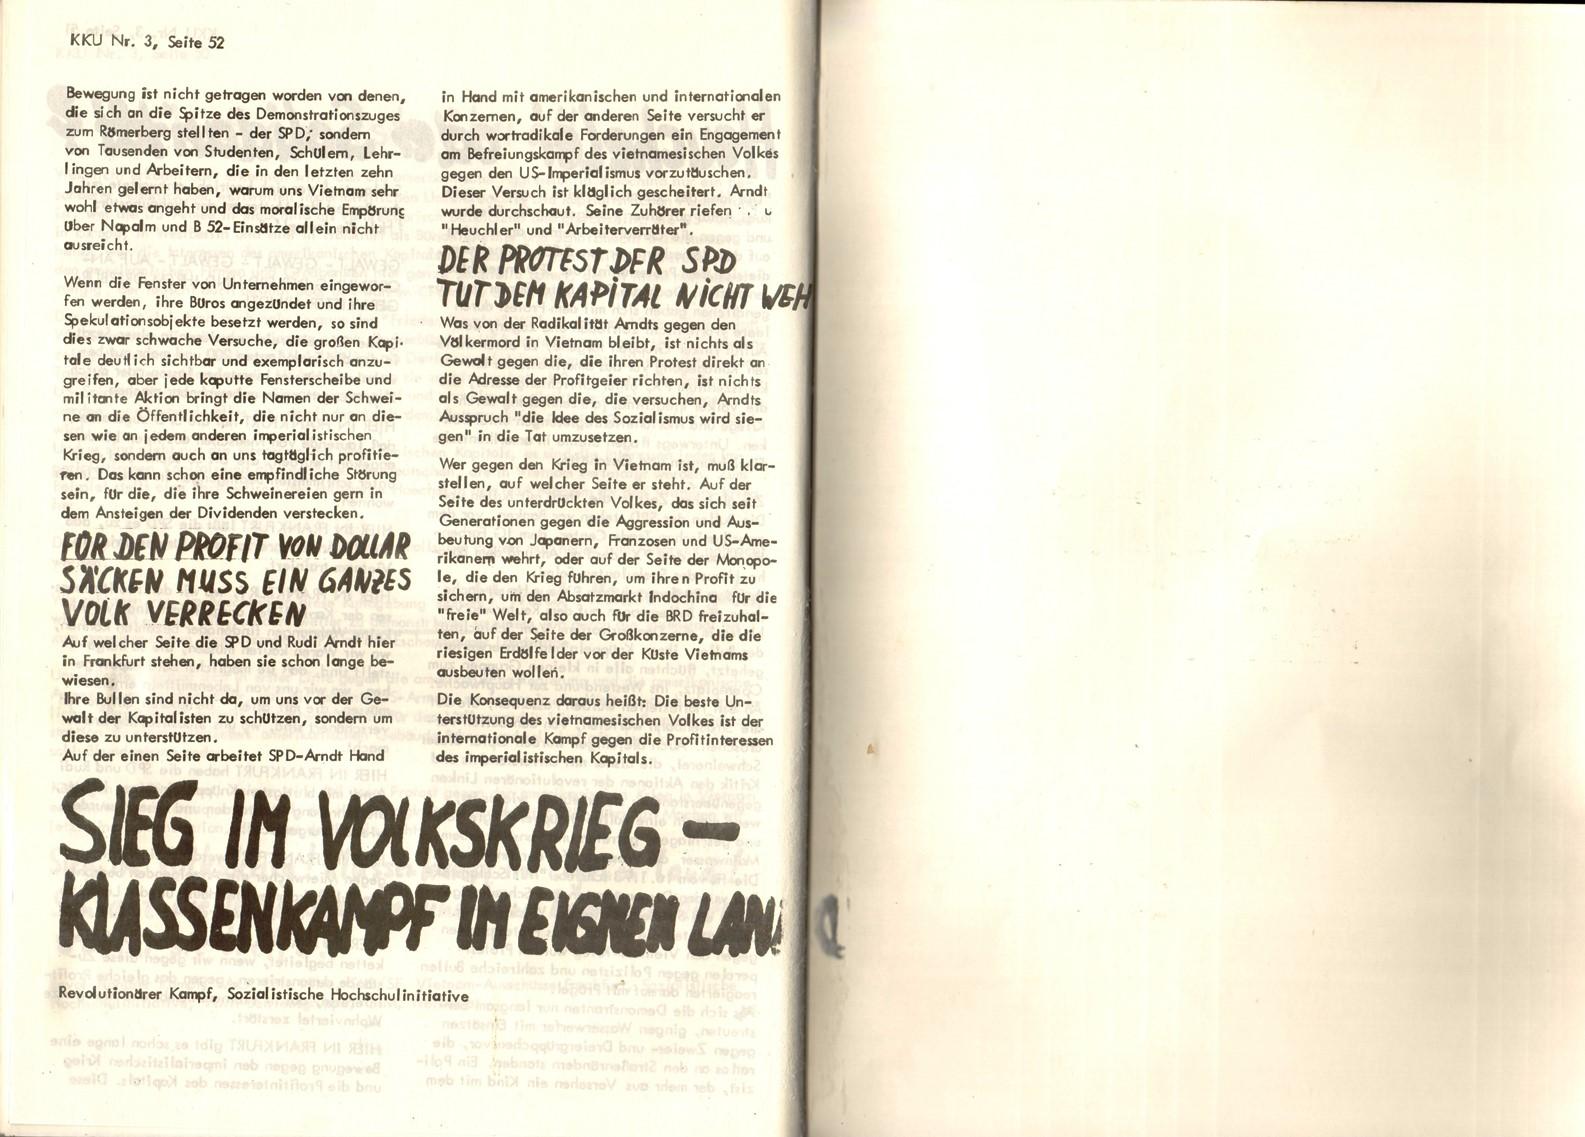 Frankfurt_Offenbach_KG_Kampf_Kritik_Umgestaltung_1973_03_28